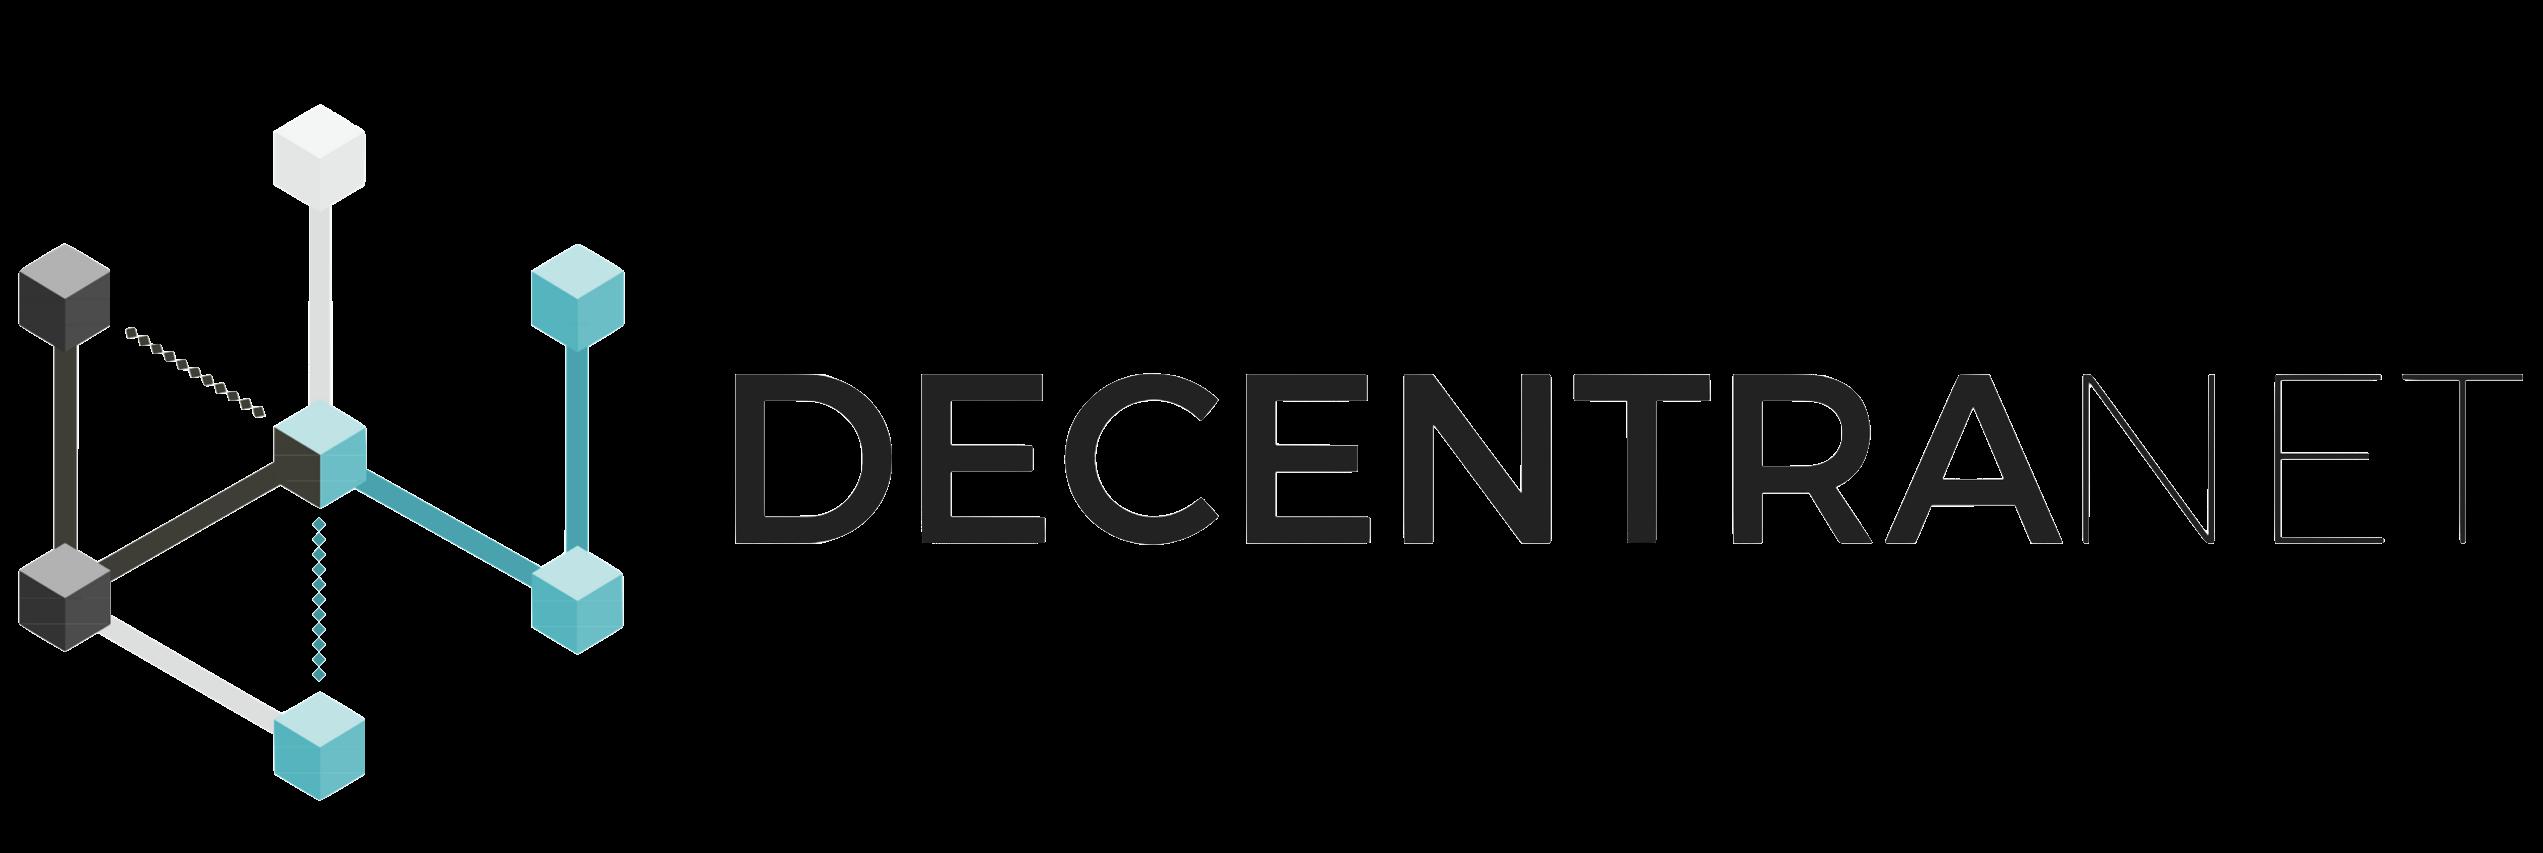 DecentraNet Web Logo Trns